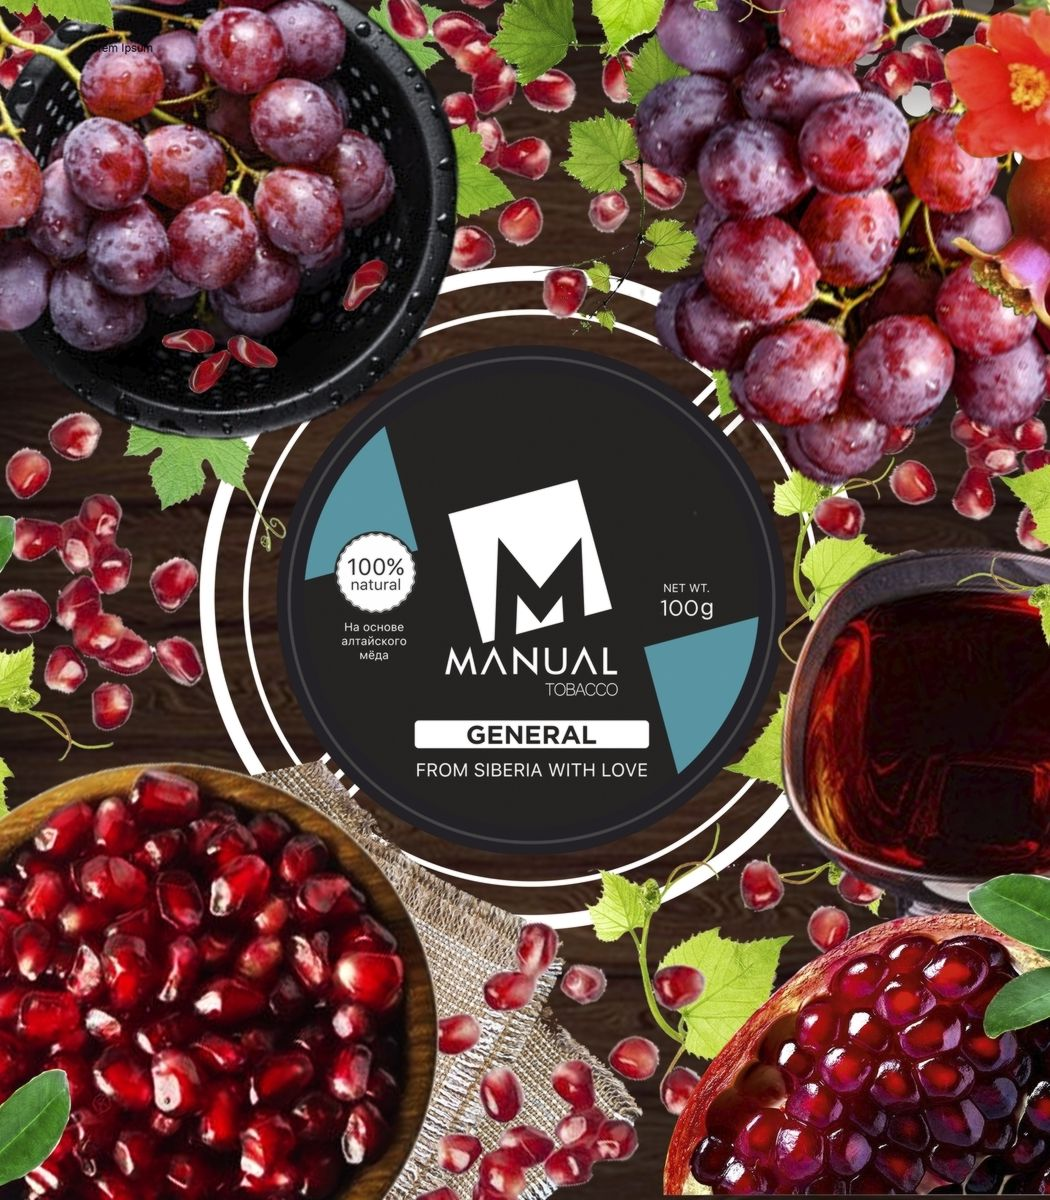 Manual синий Гранат-Виноград